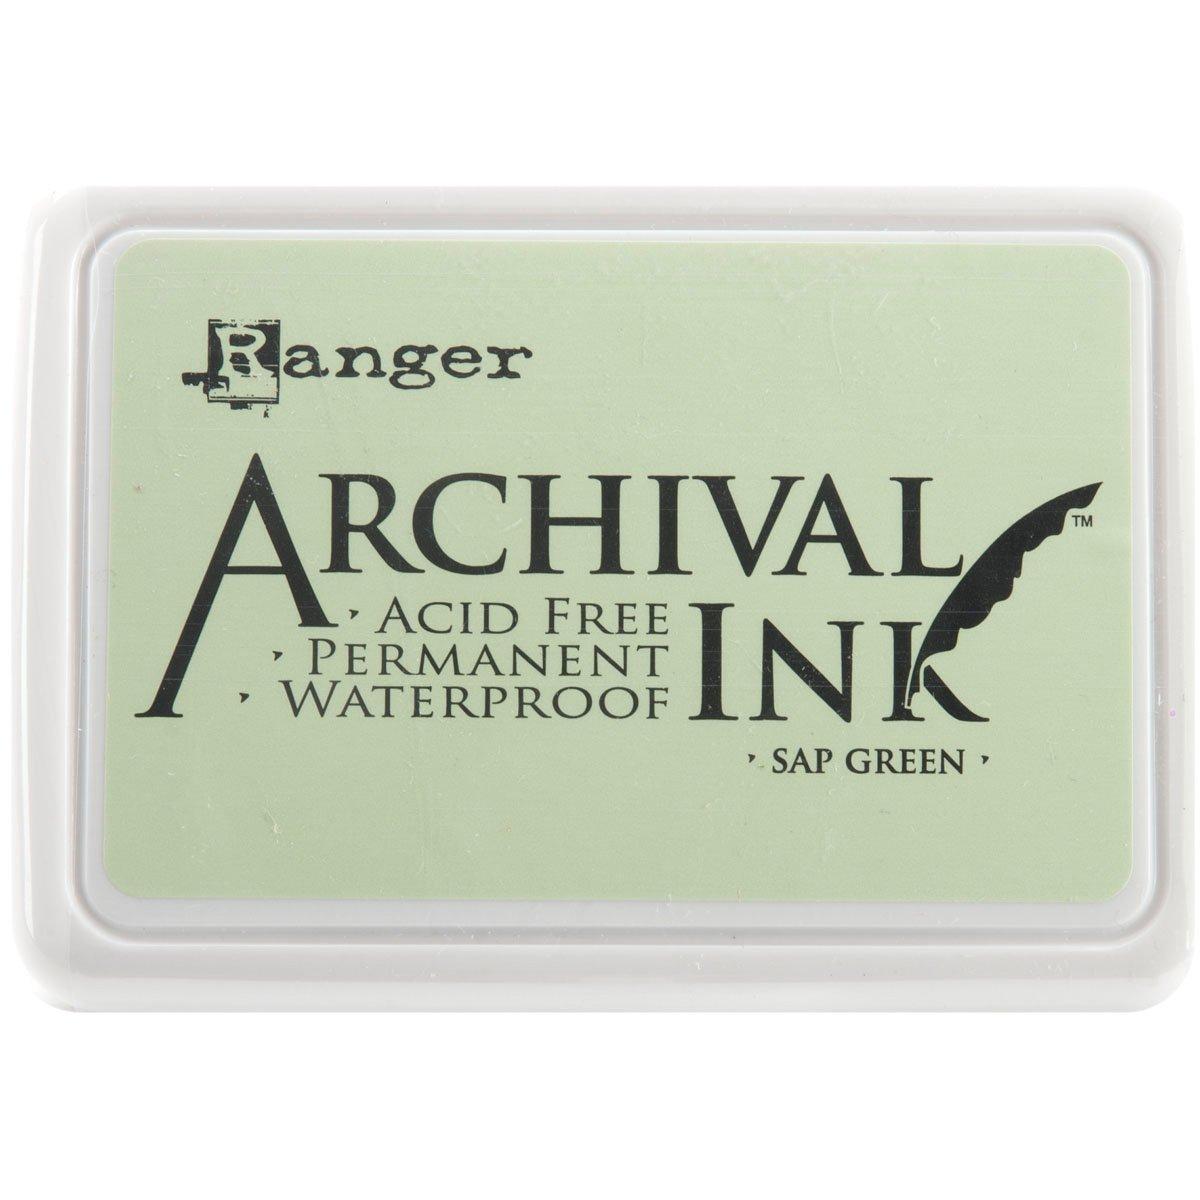 Ranger AIP-30645 Archival Inkpad, Sap Green by Ranger   B004W8RPPE